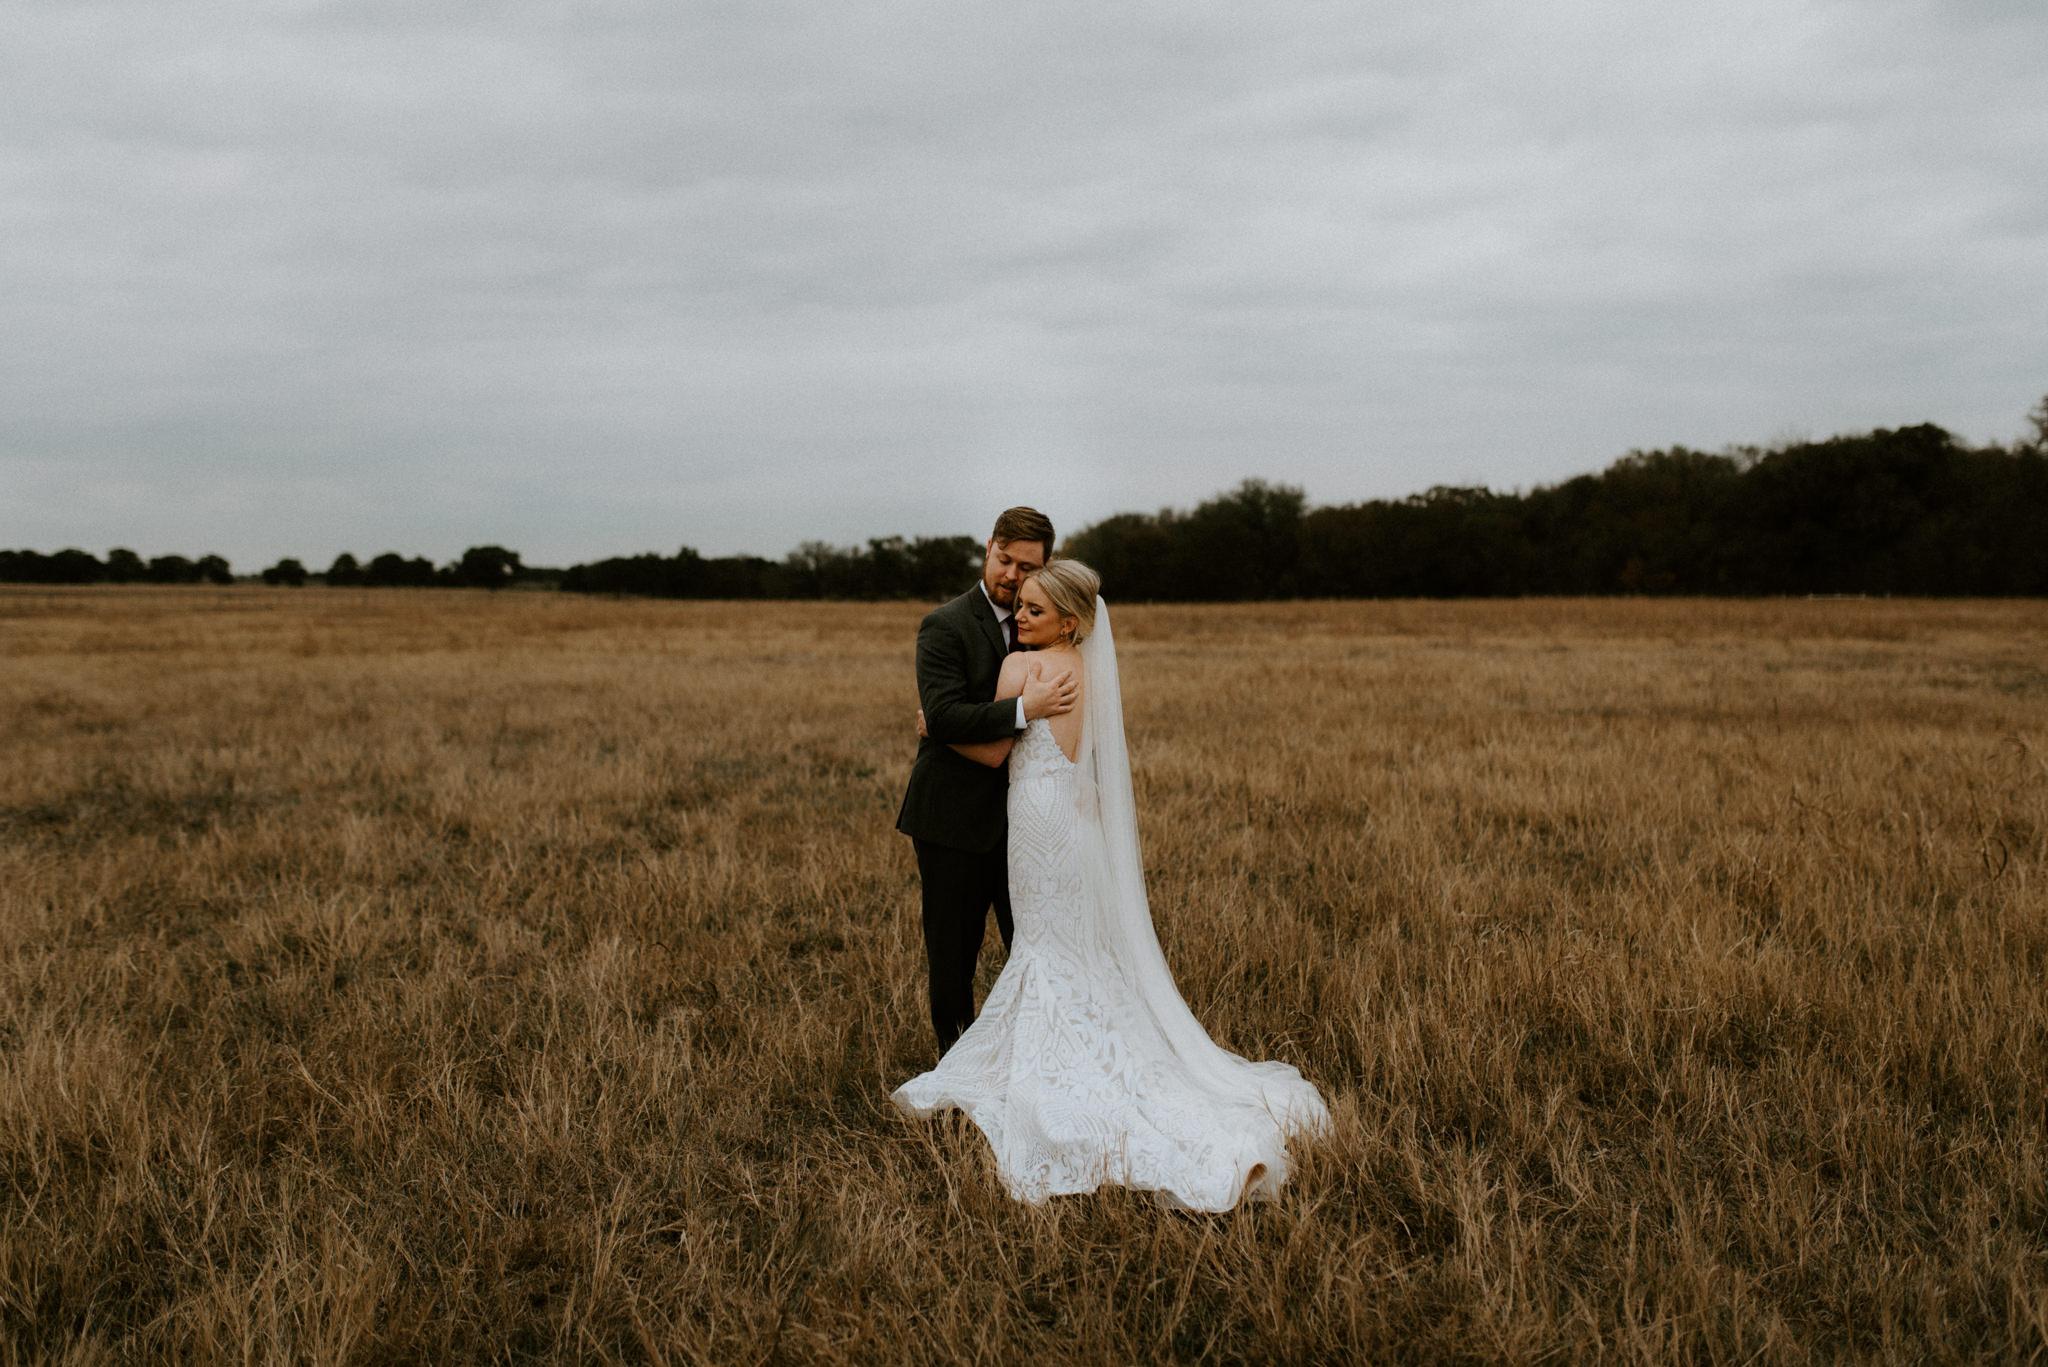 Moody-Vintage-Chic-Wedding-Vintage-Oaks-Wedding-Venue-Kerlyn-Van-gelder-Photography-Austin-Wedding-Photographer469.jpg